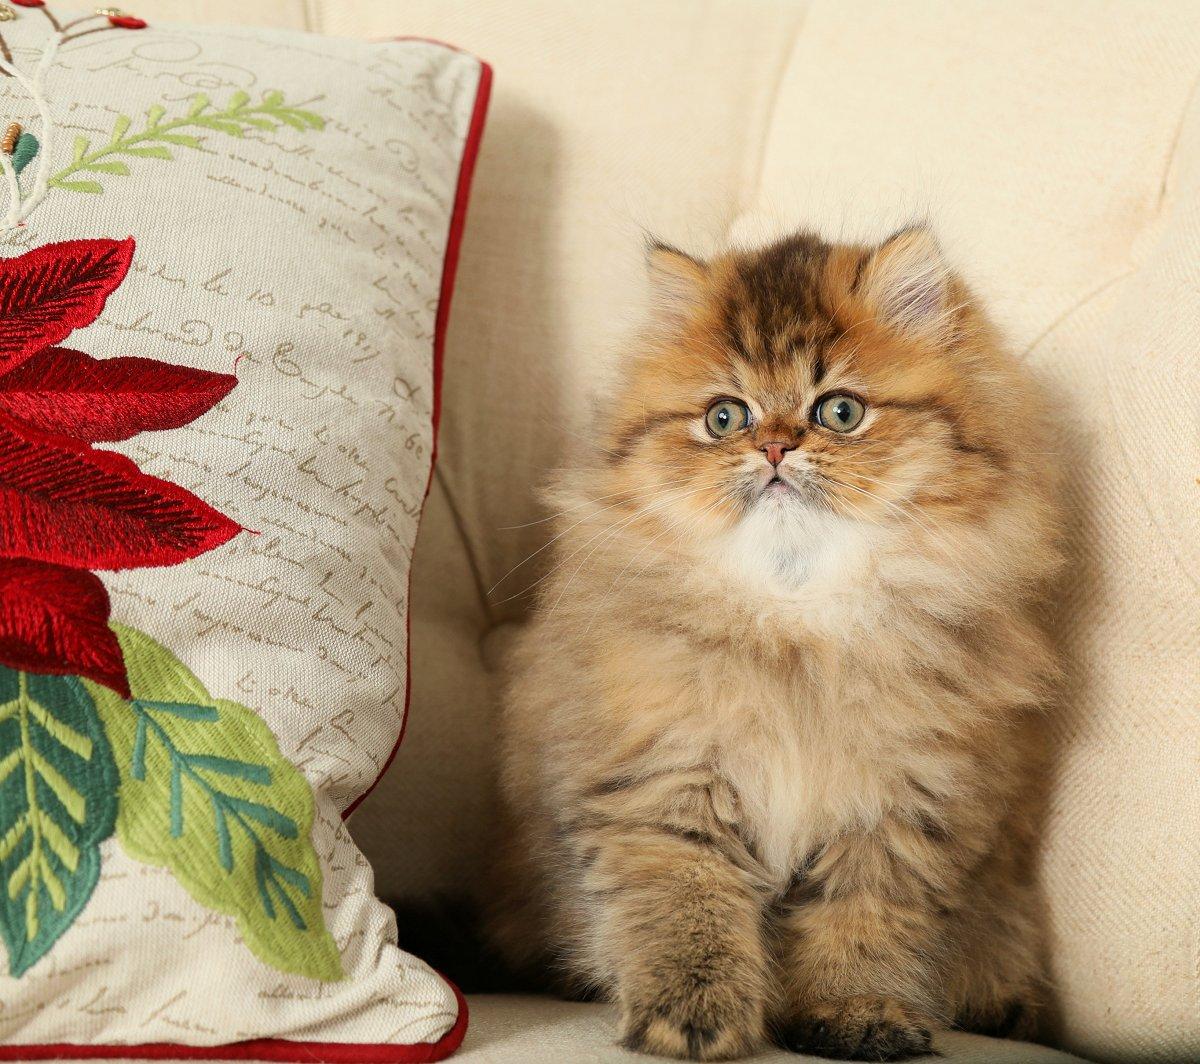 Persian Kittens For Sale In Miami